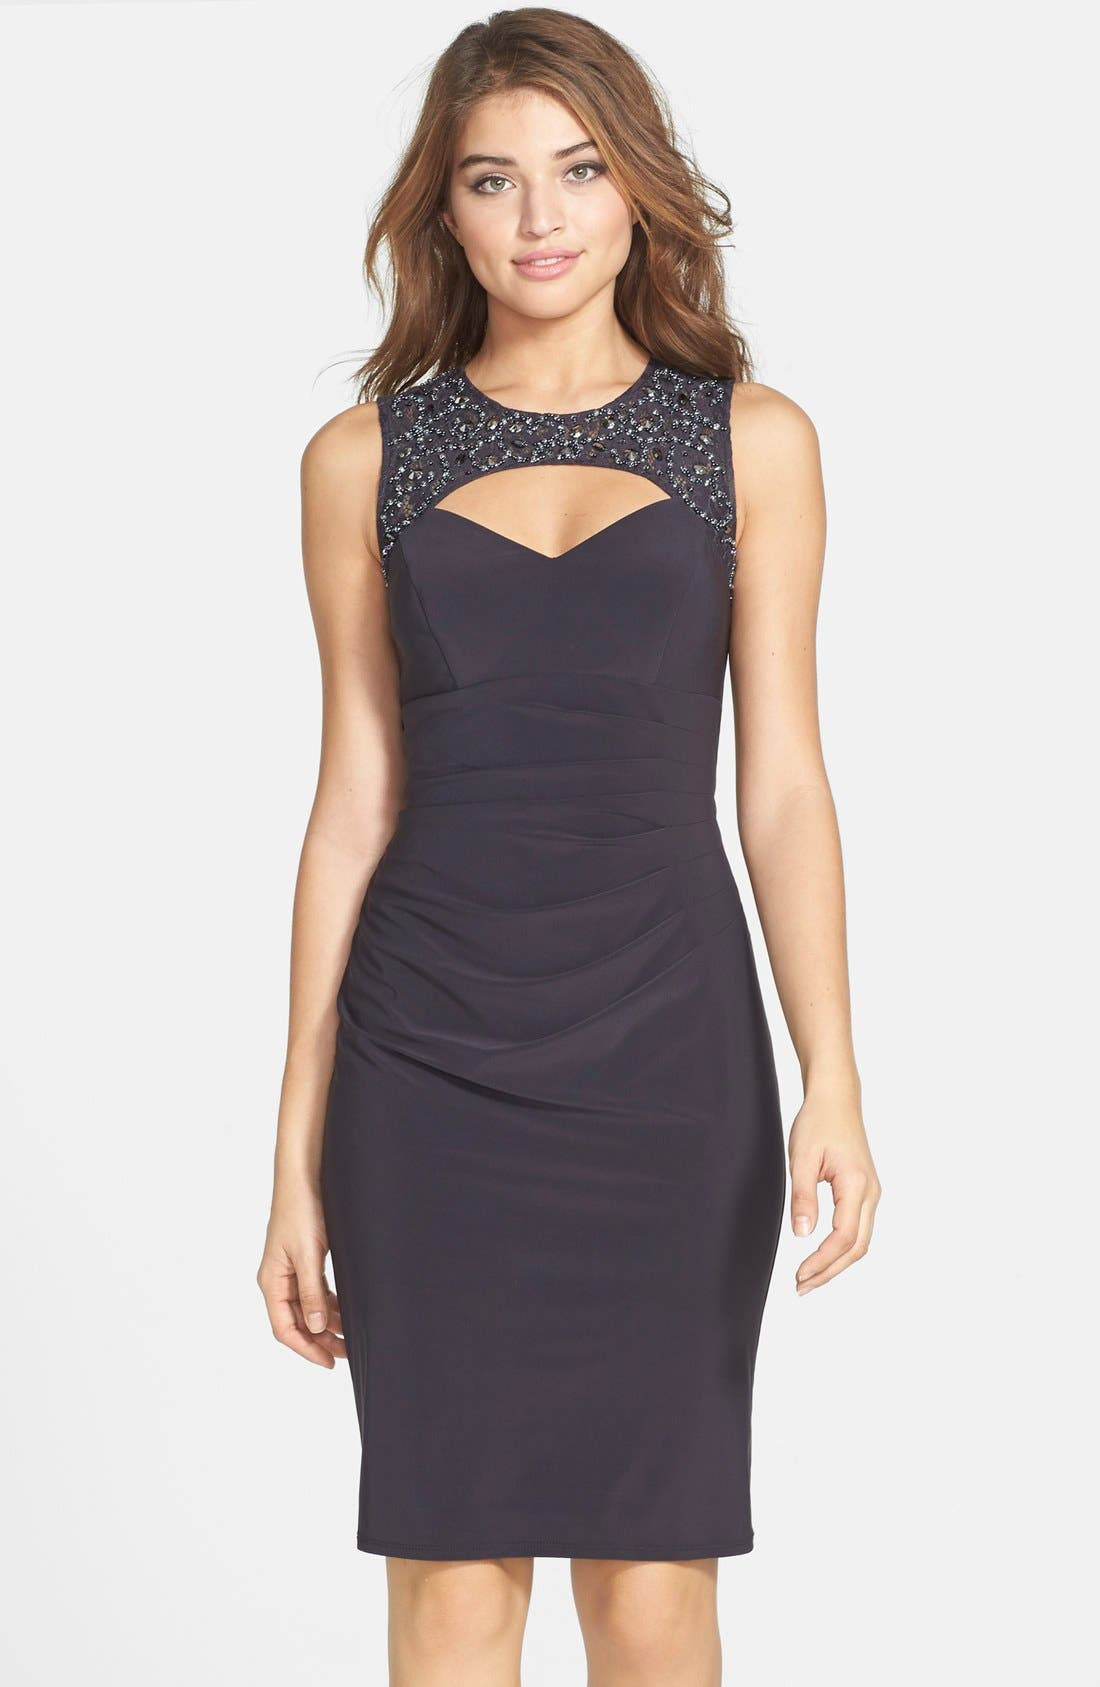 Alternate Image 1 Selected - Xscape Embellished Lace & Jersey Cutout Sheath Dress